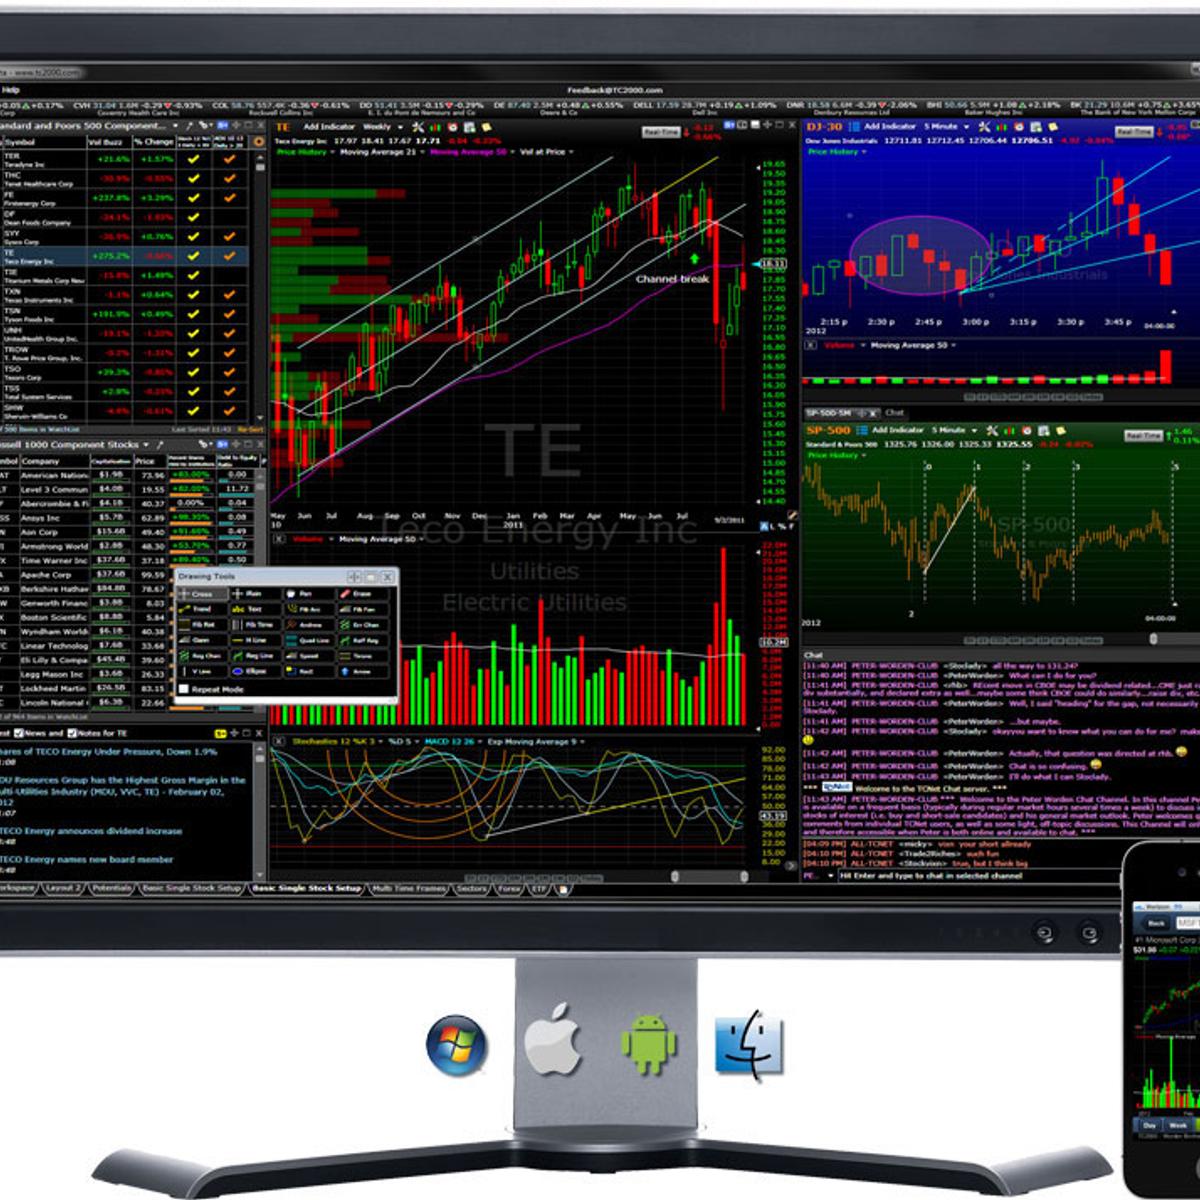 Tc trading system